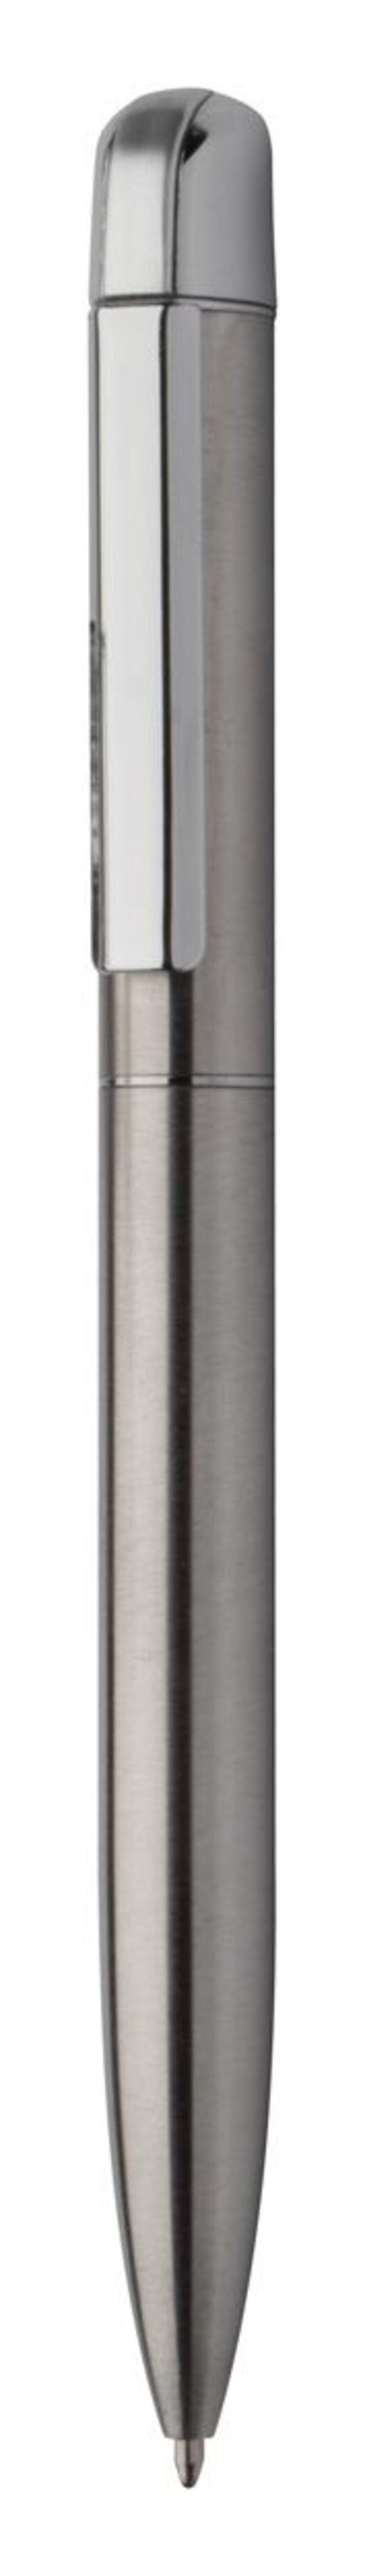 Edels ballpoint pen